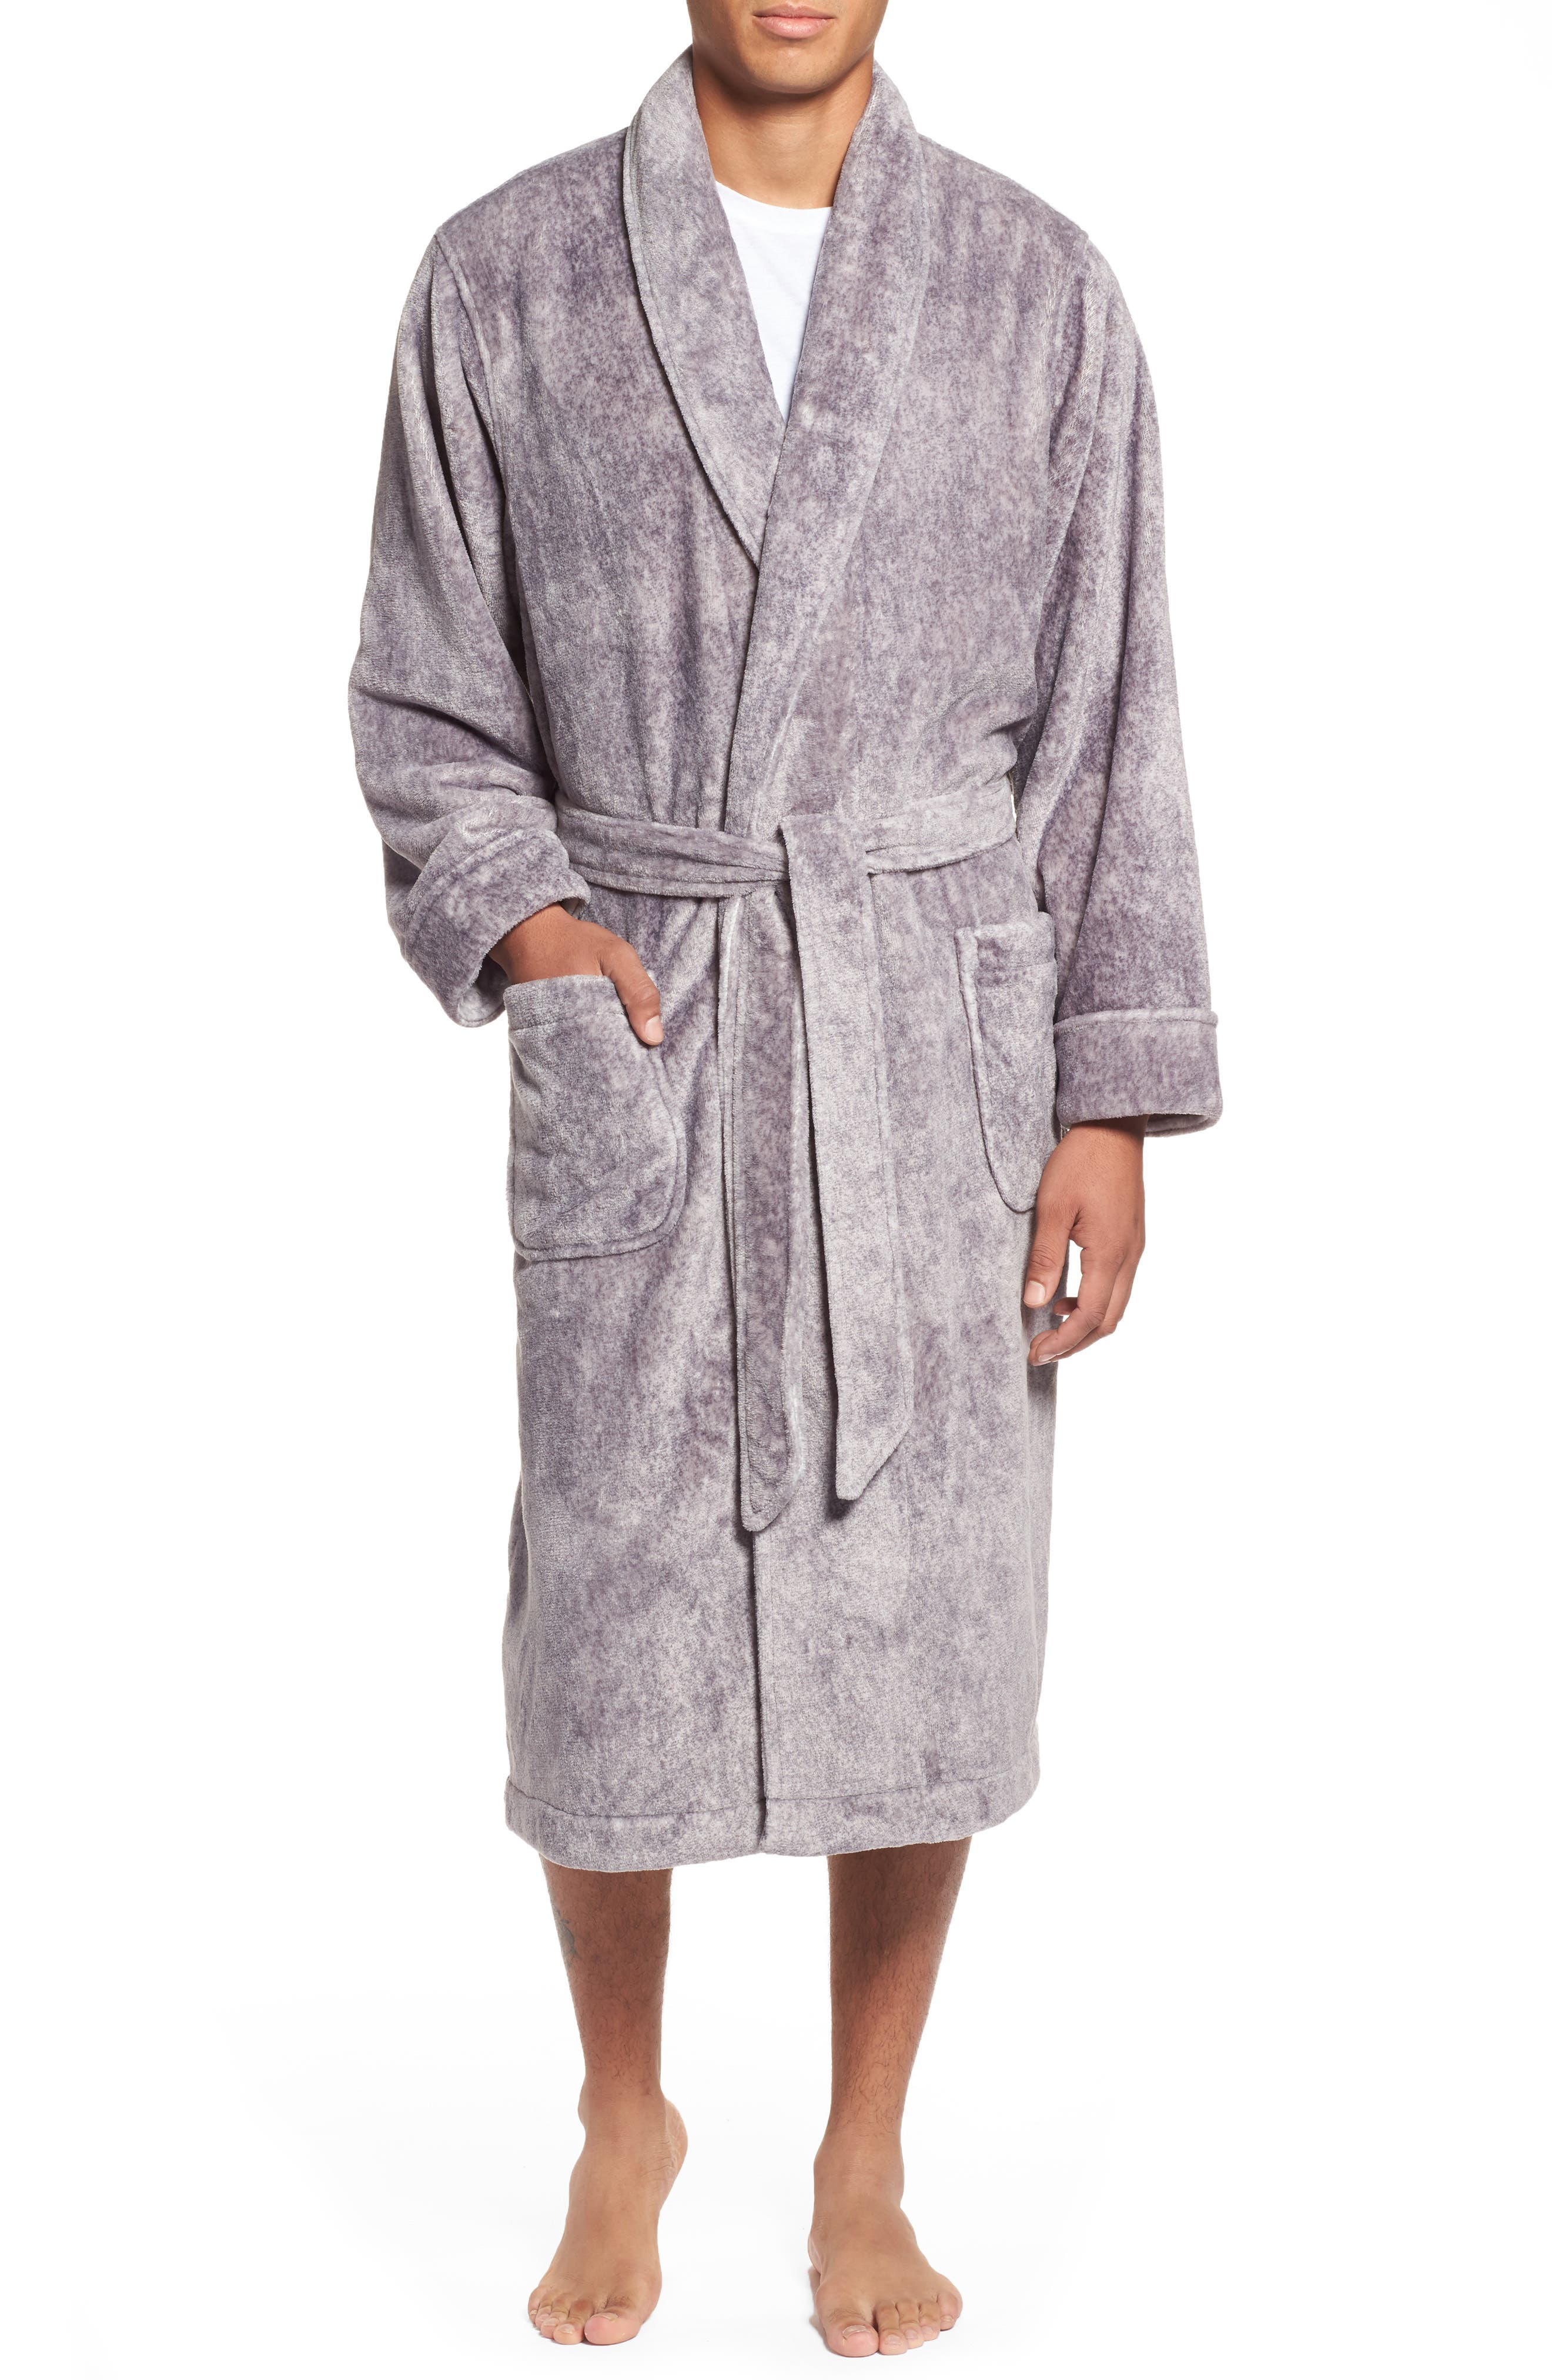 Alternate Image 1 Selected - Nordstrom Men's Shop Heathered Fleece Robe